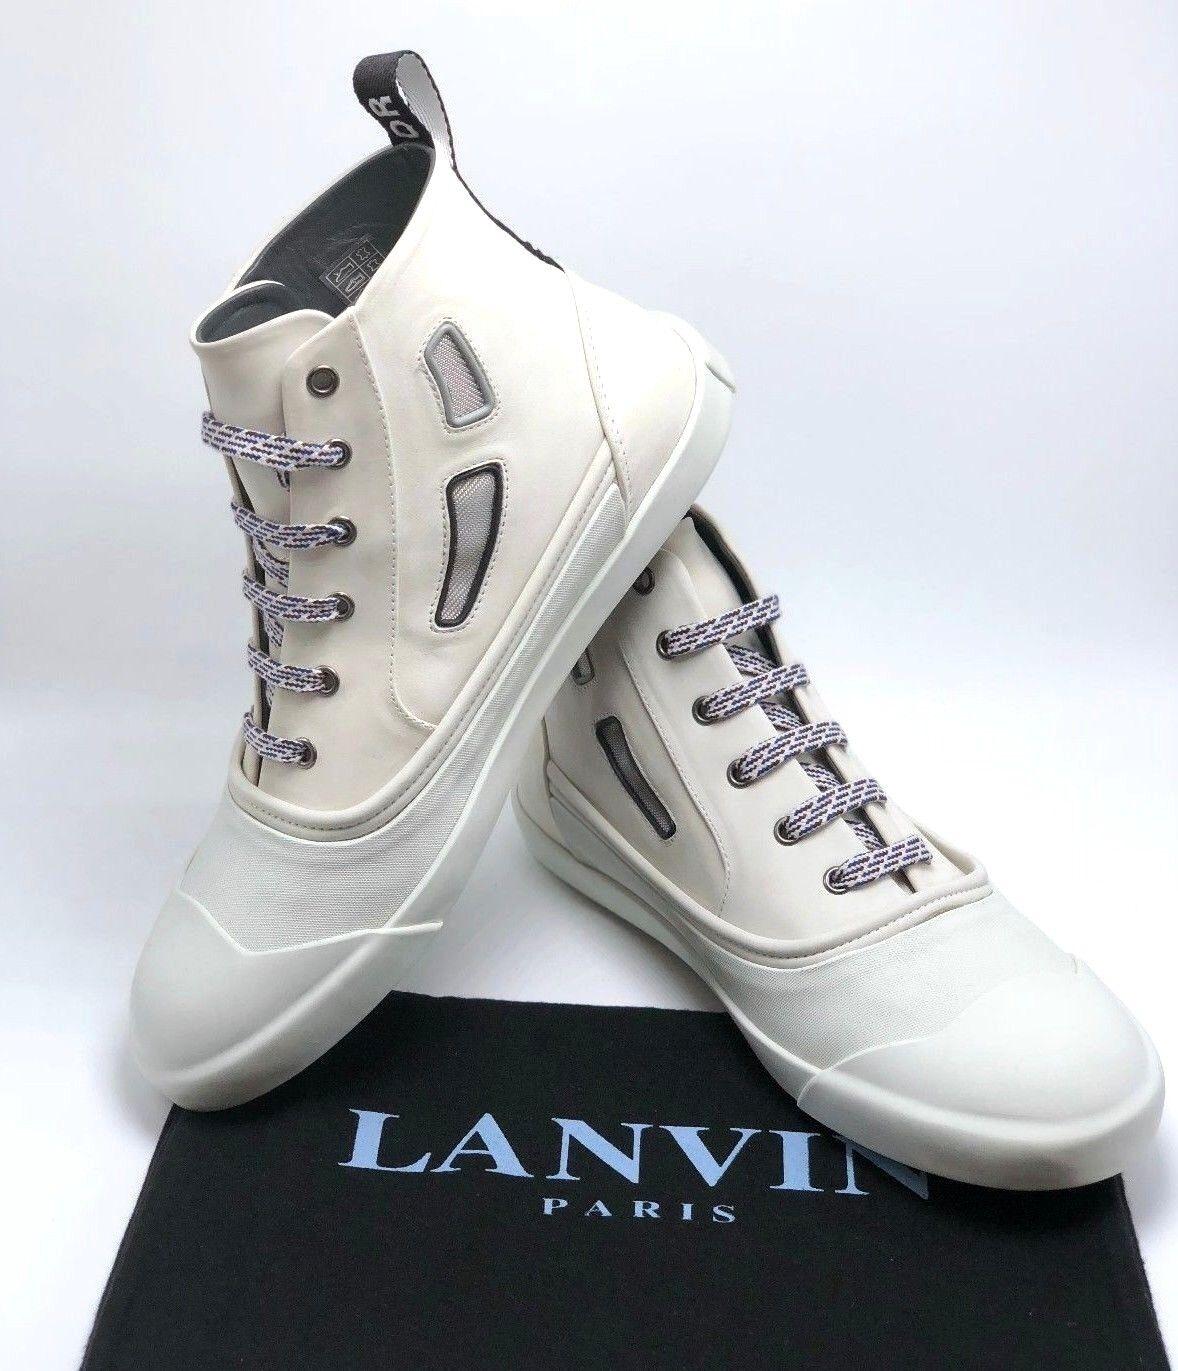 Scarpe casual da uomo  0 LANVIN Vulcanized Calfskin Mid-Top Sneaker Aged White Sz.7